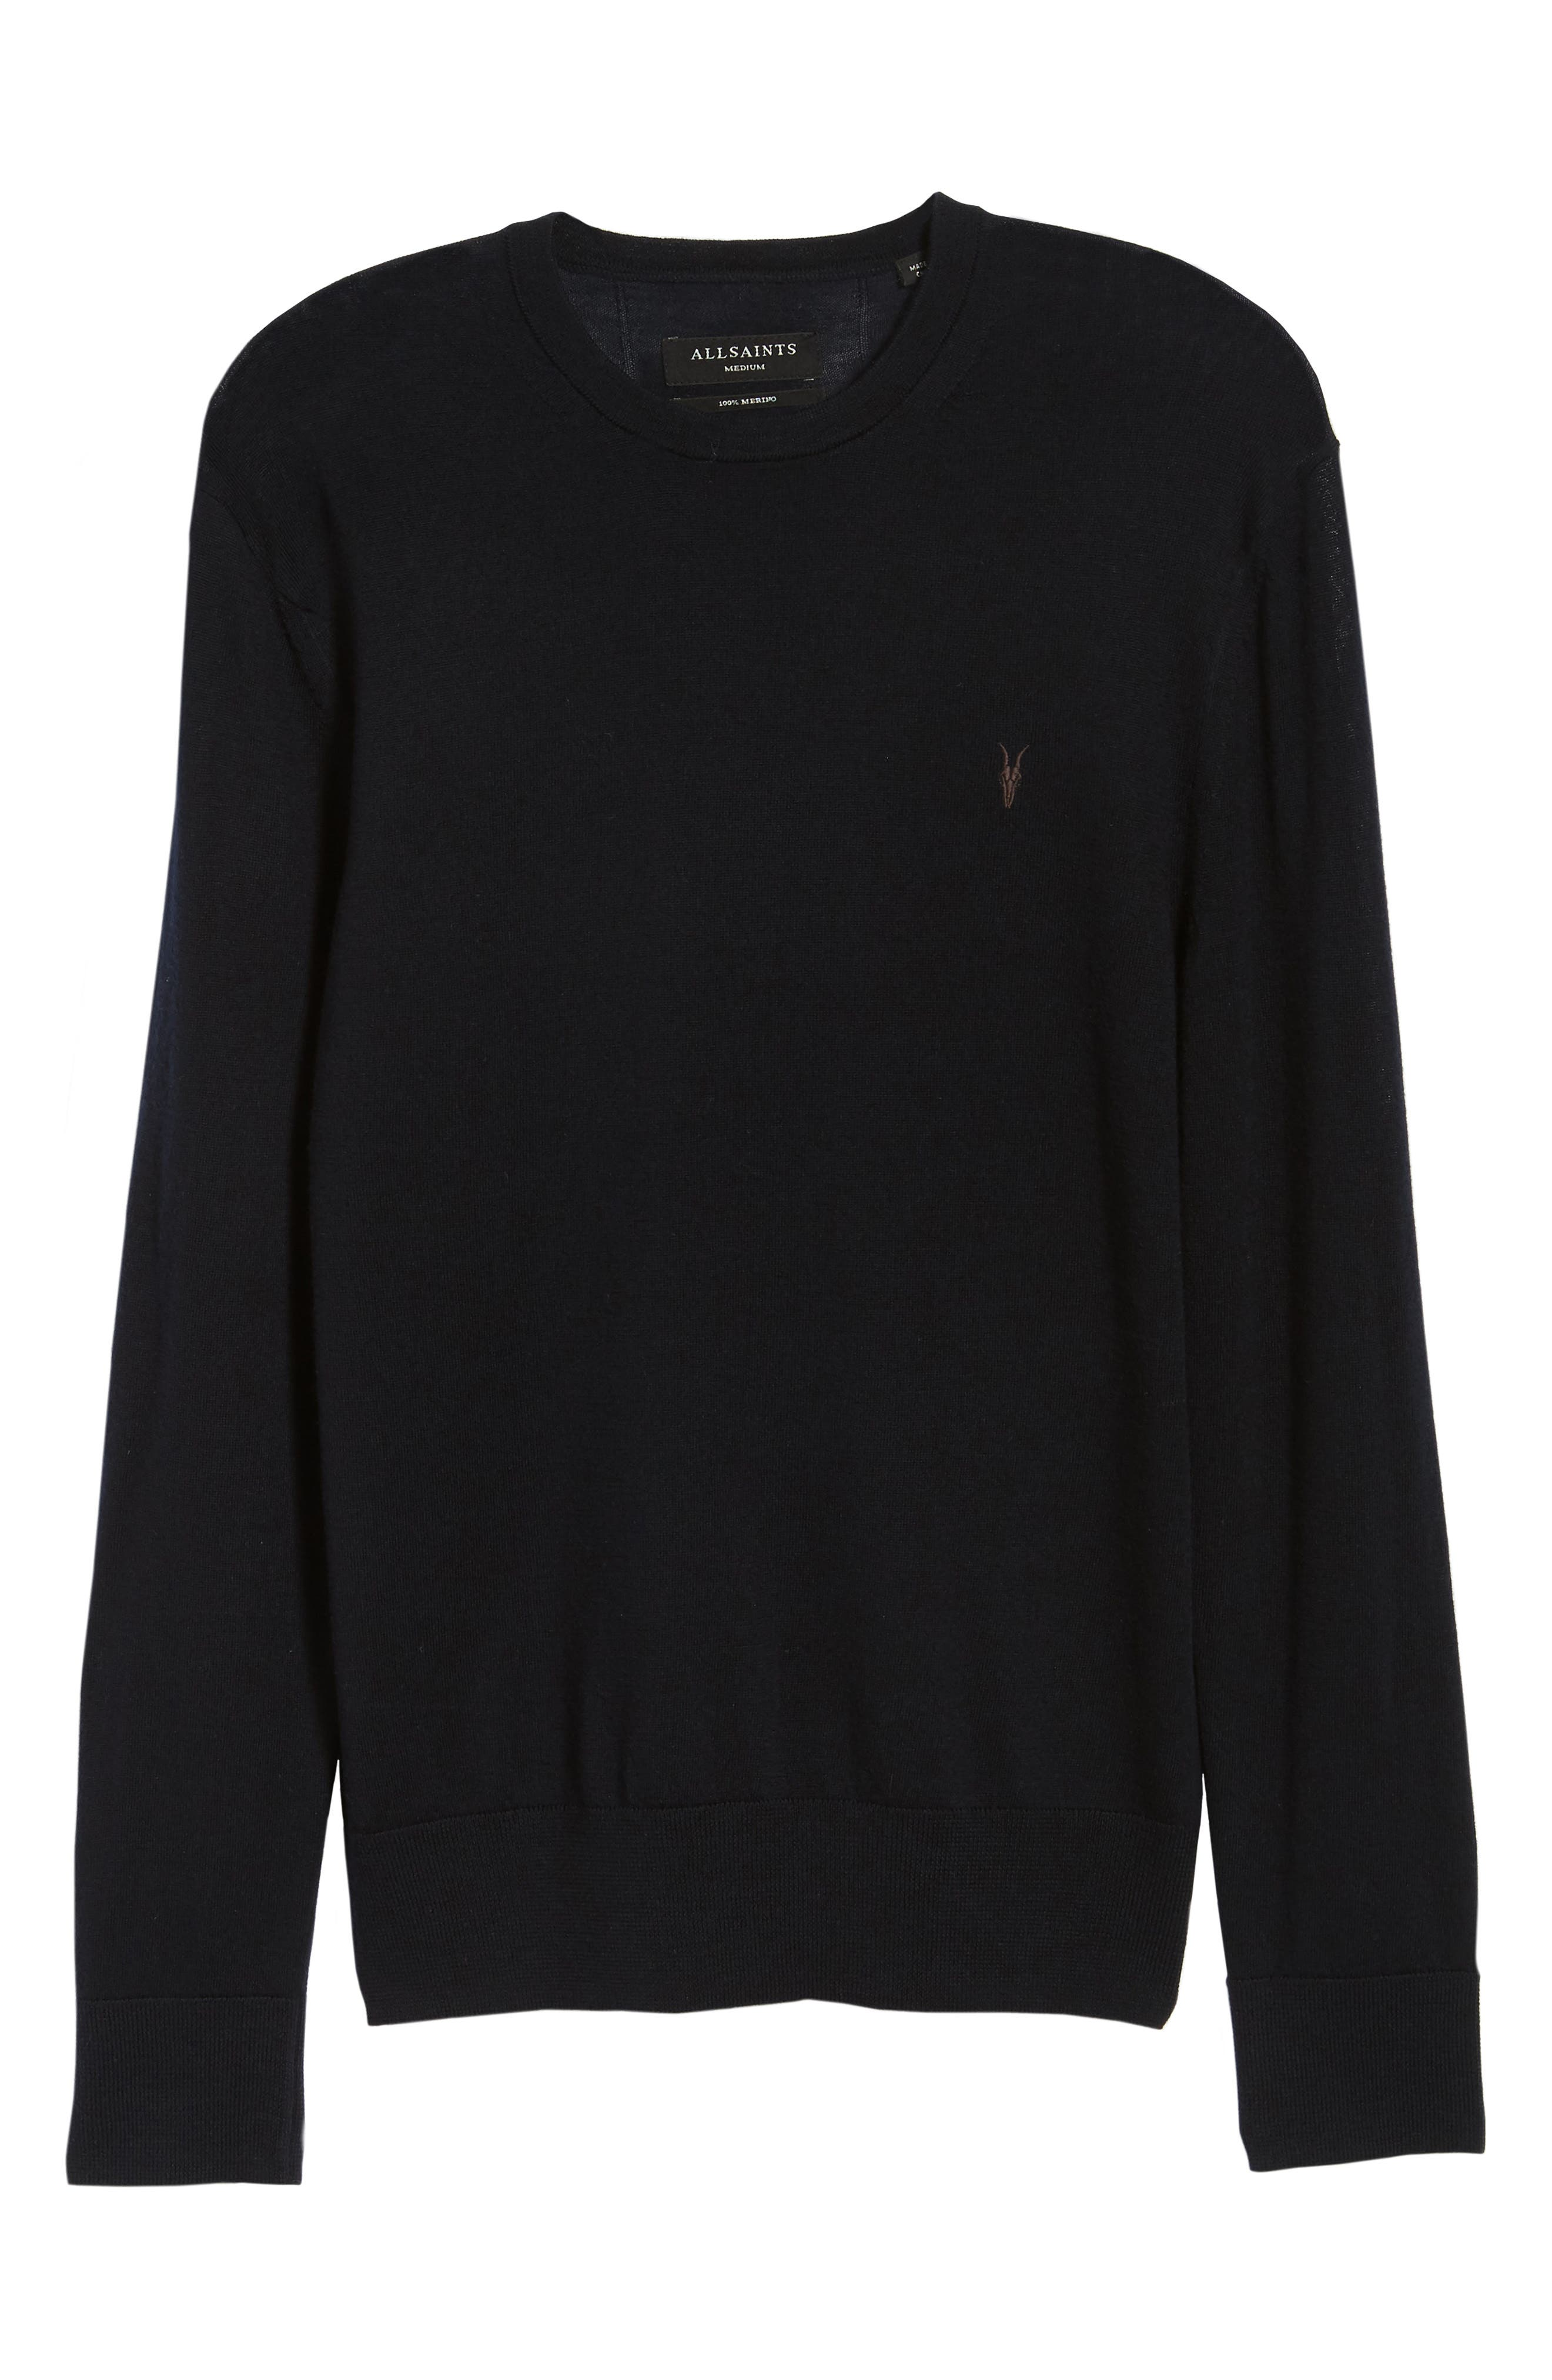 Mode Slim Fit Merino Wool Sweater,                             Alternate thumbnail 33, color,